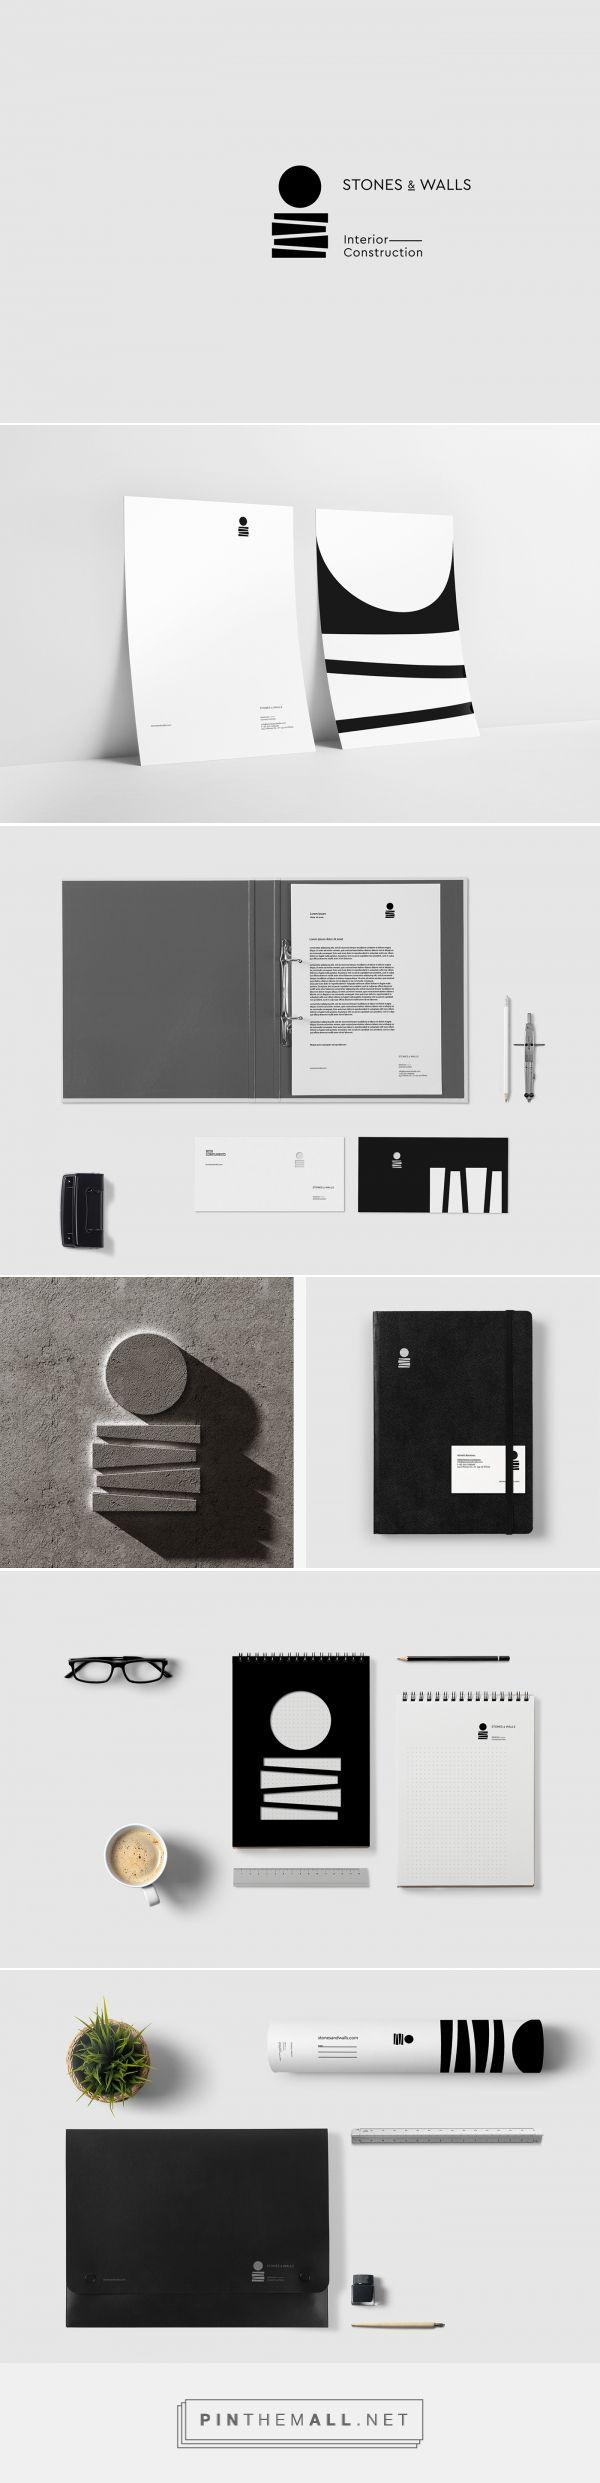 Stones & Walls Interior Construction Branding by Luminous Design Group | Fivestar Branding Agency – Design and Branding Agency & Curated Inspiration Gallery